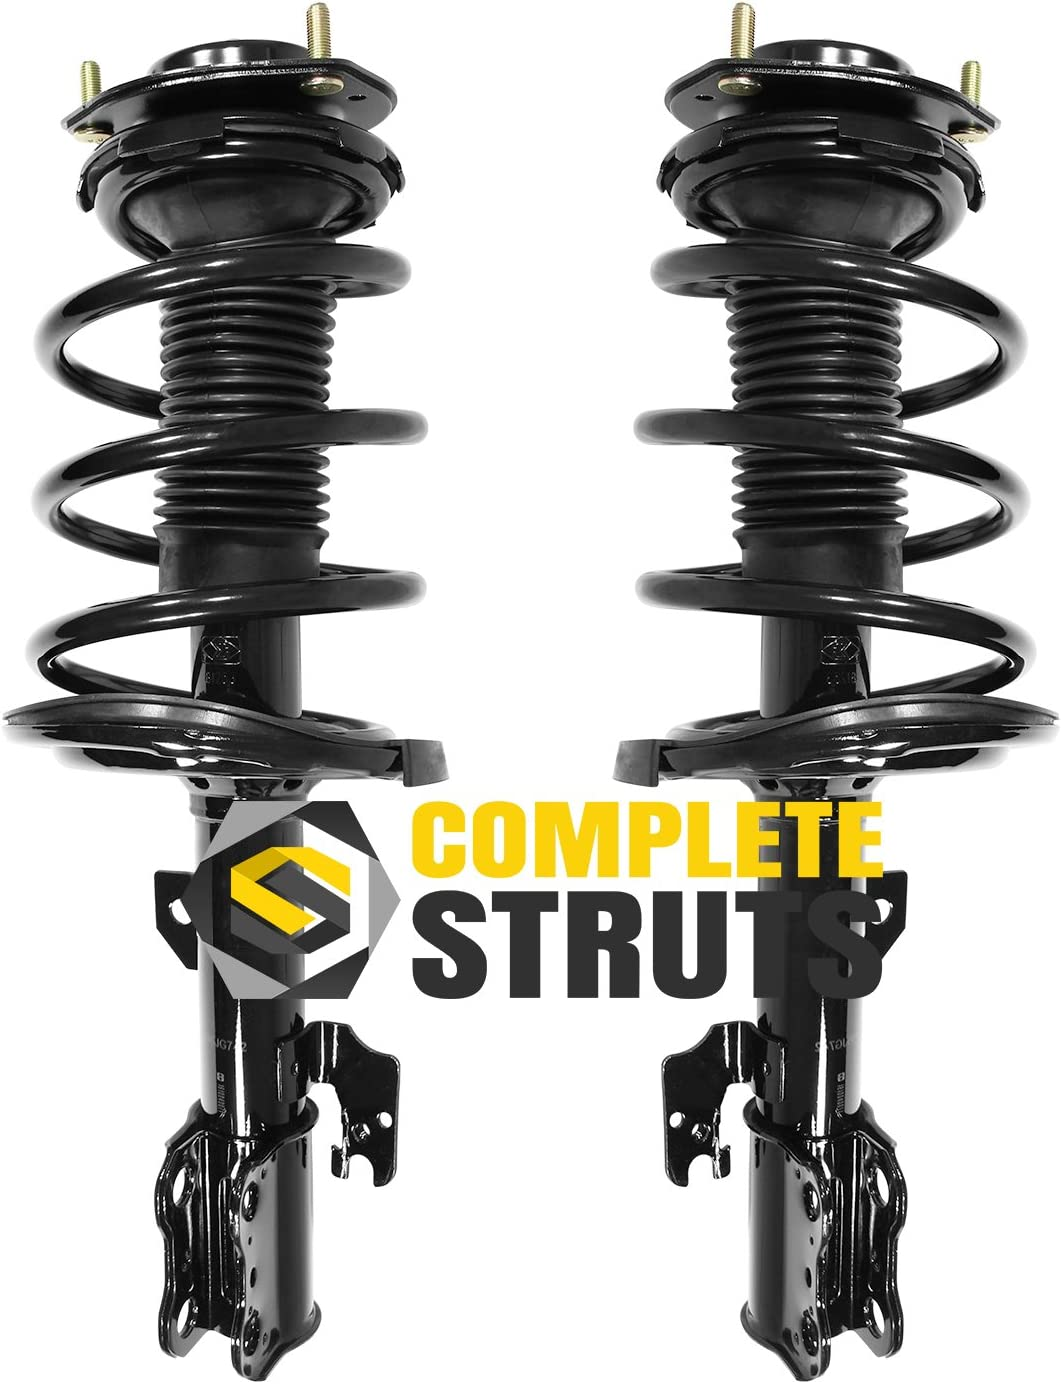 Front Pair Quick Complete Struts /& Coil Springs for 2002-2003 Lexus ES300